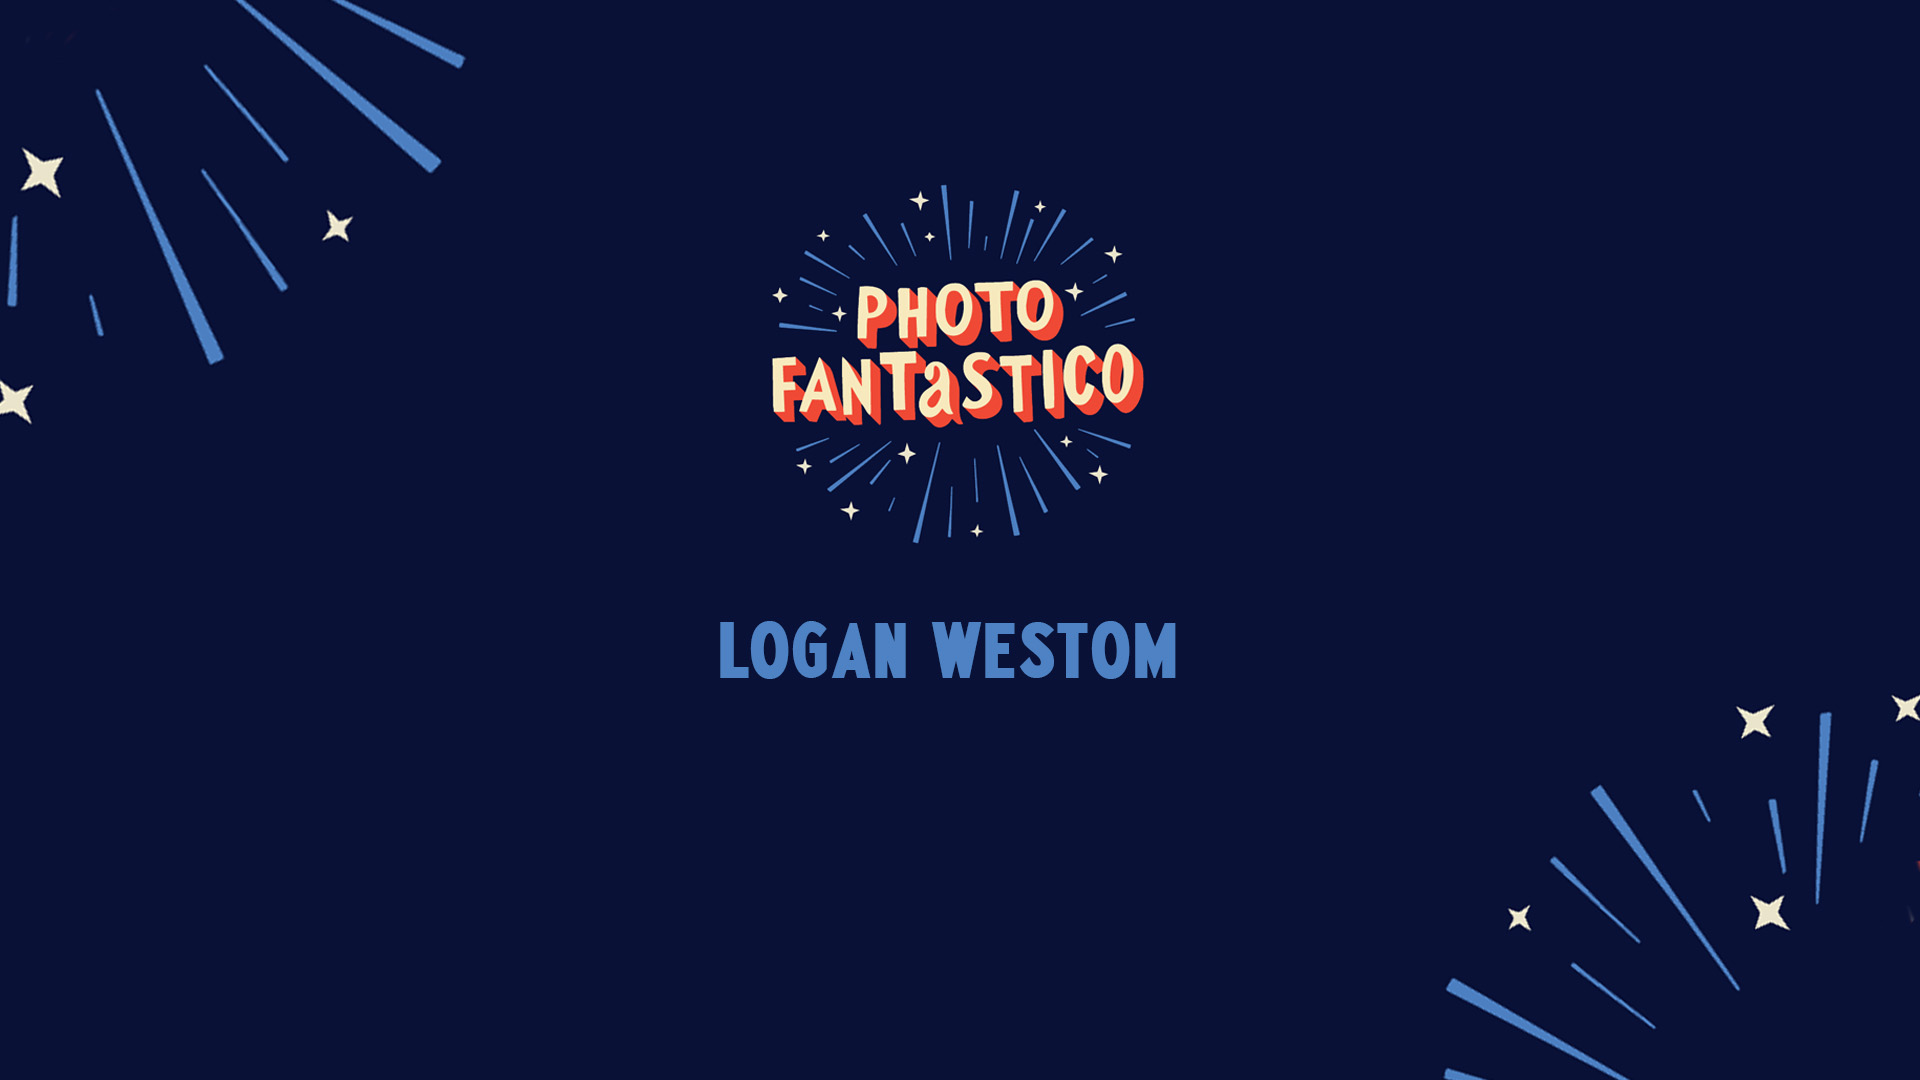 Logan Westom